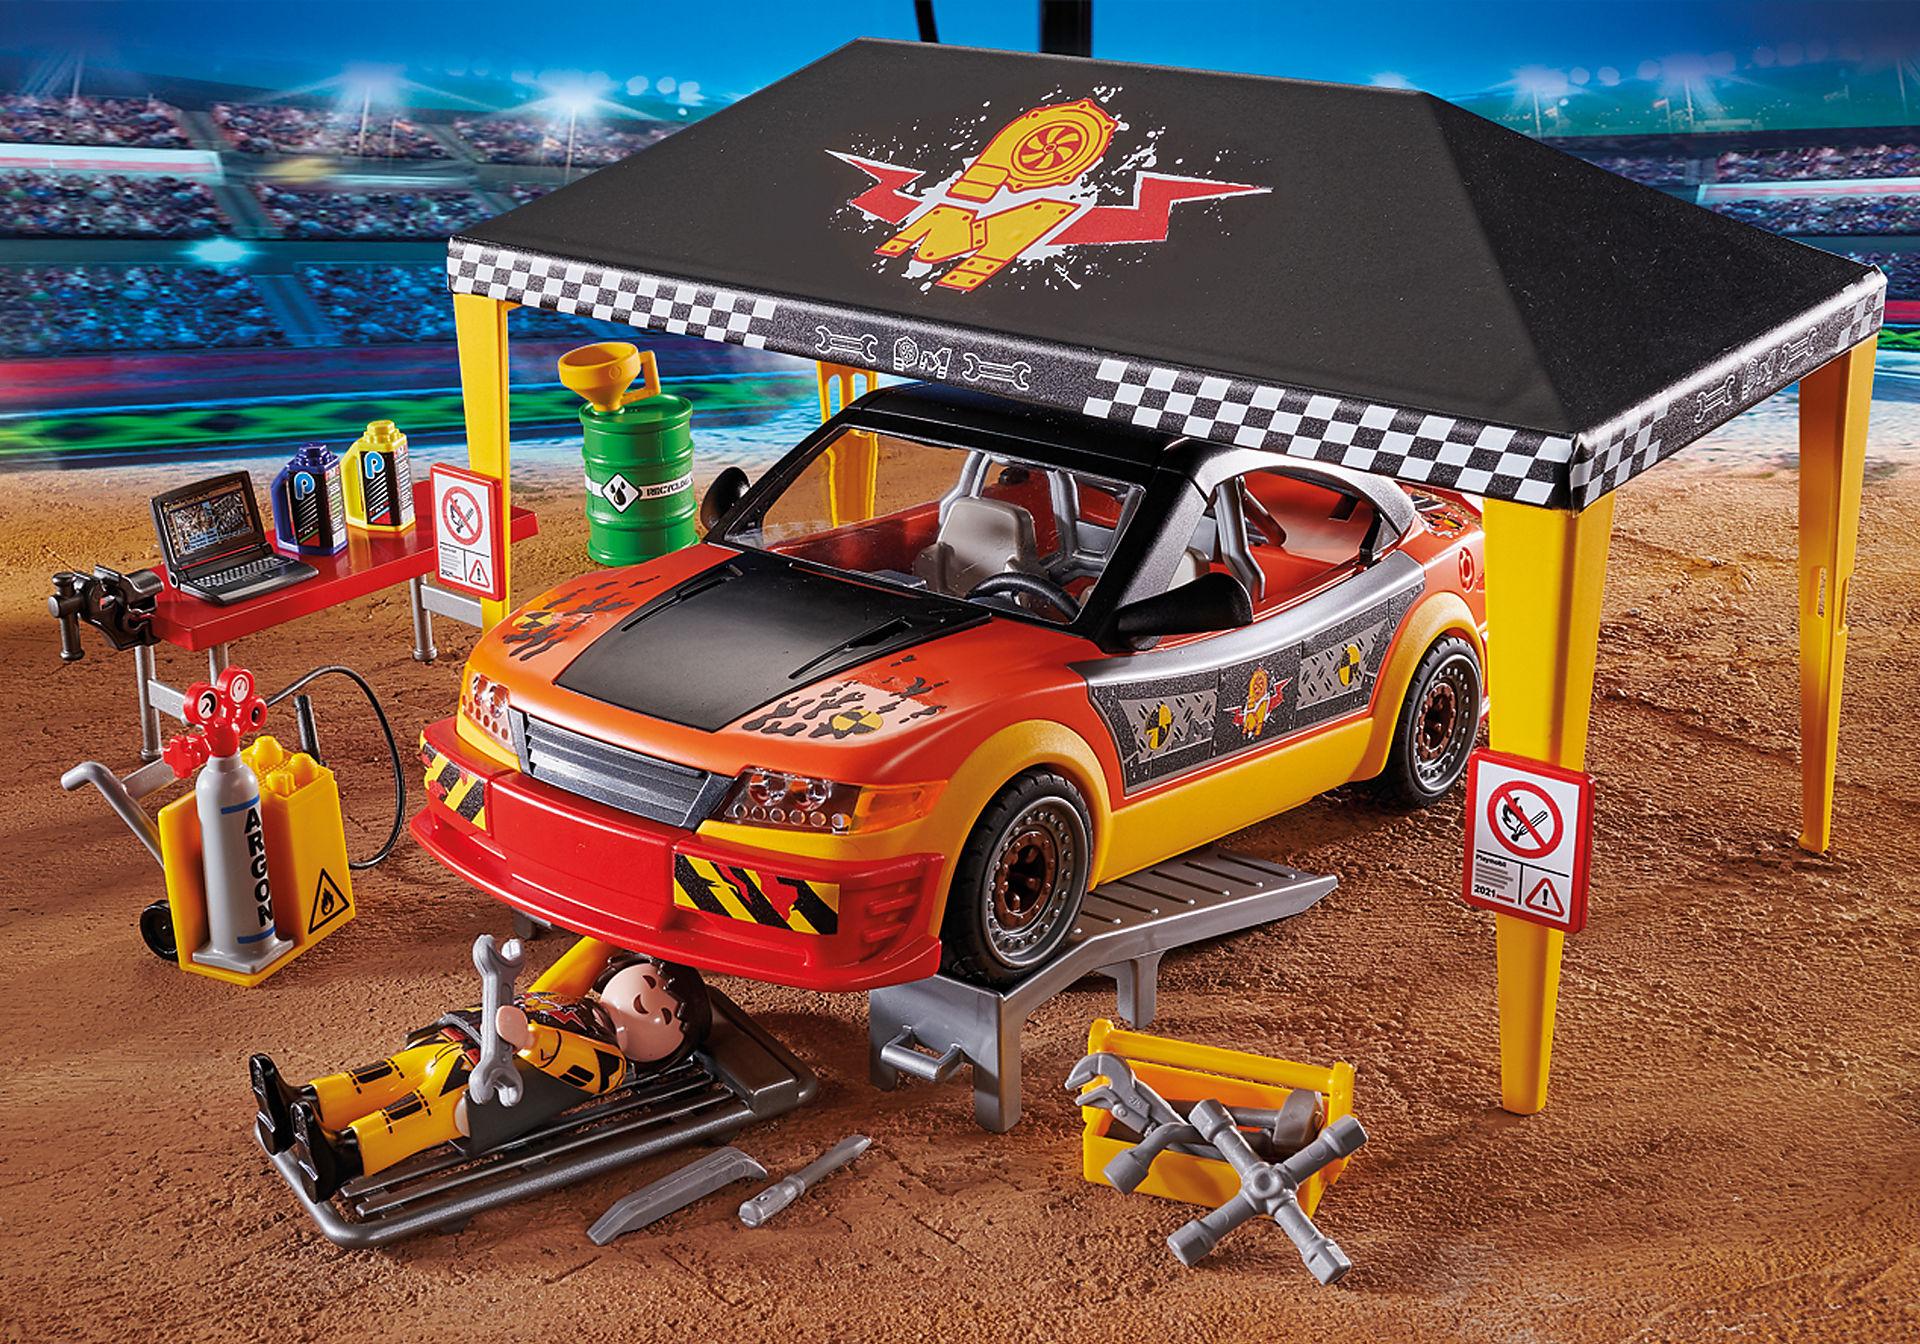 70552 Stunt Show Service Tent zoom image4